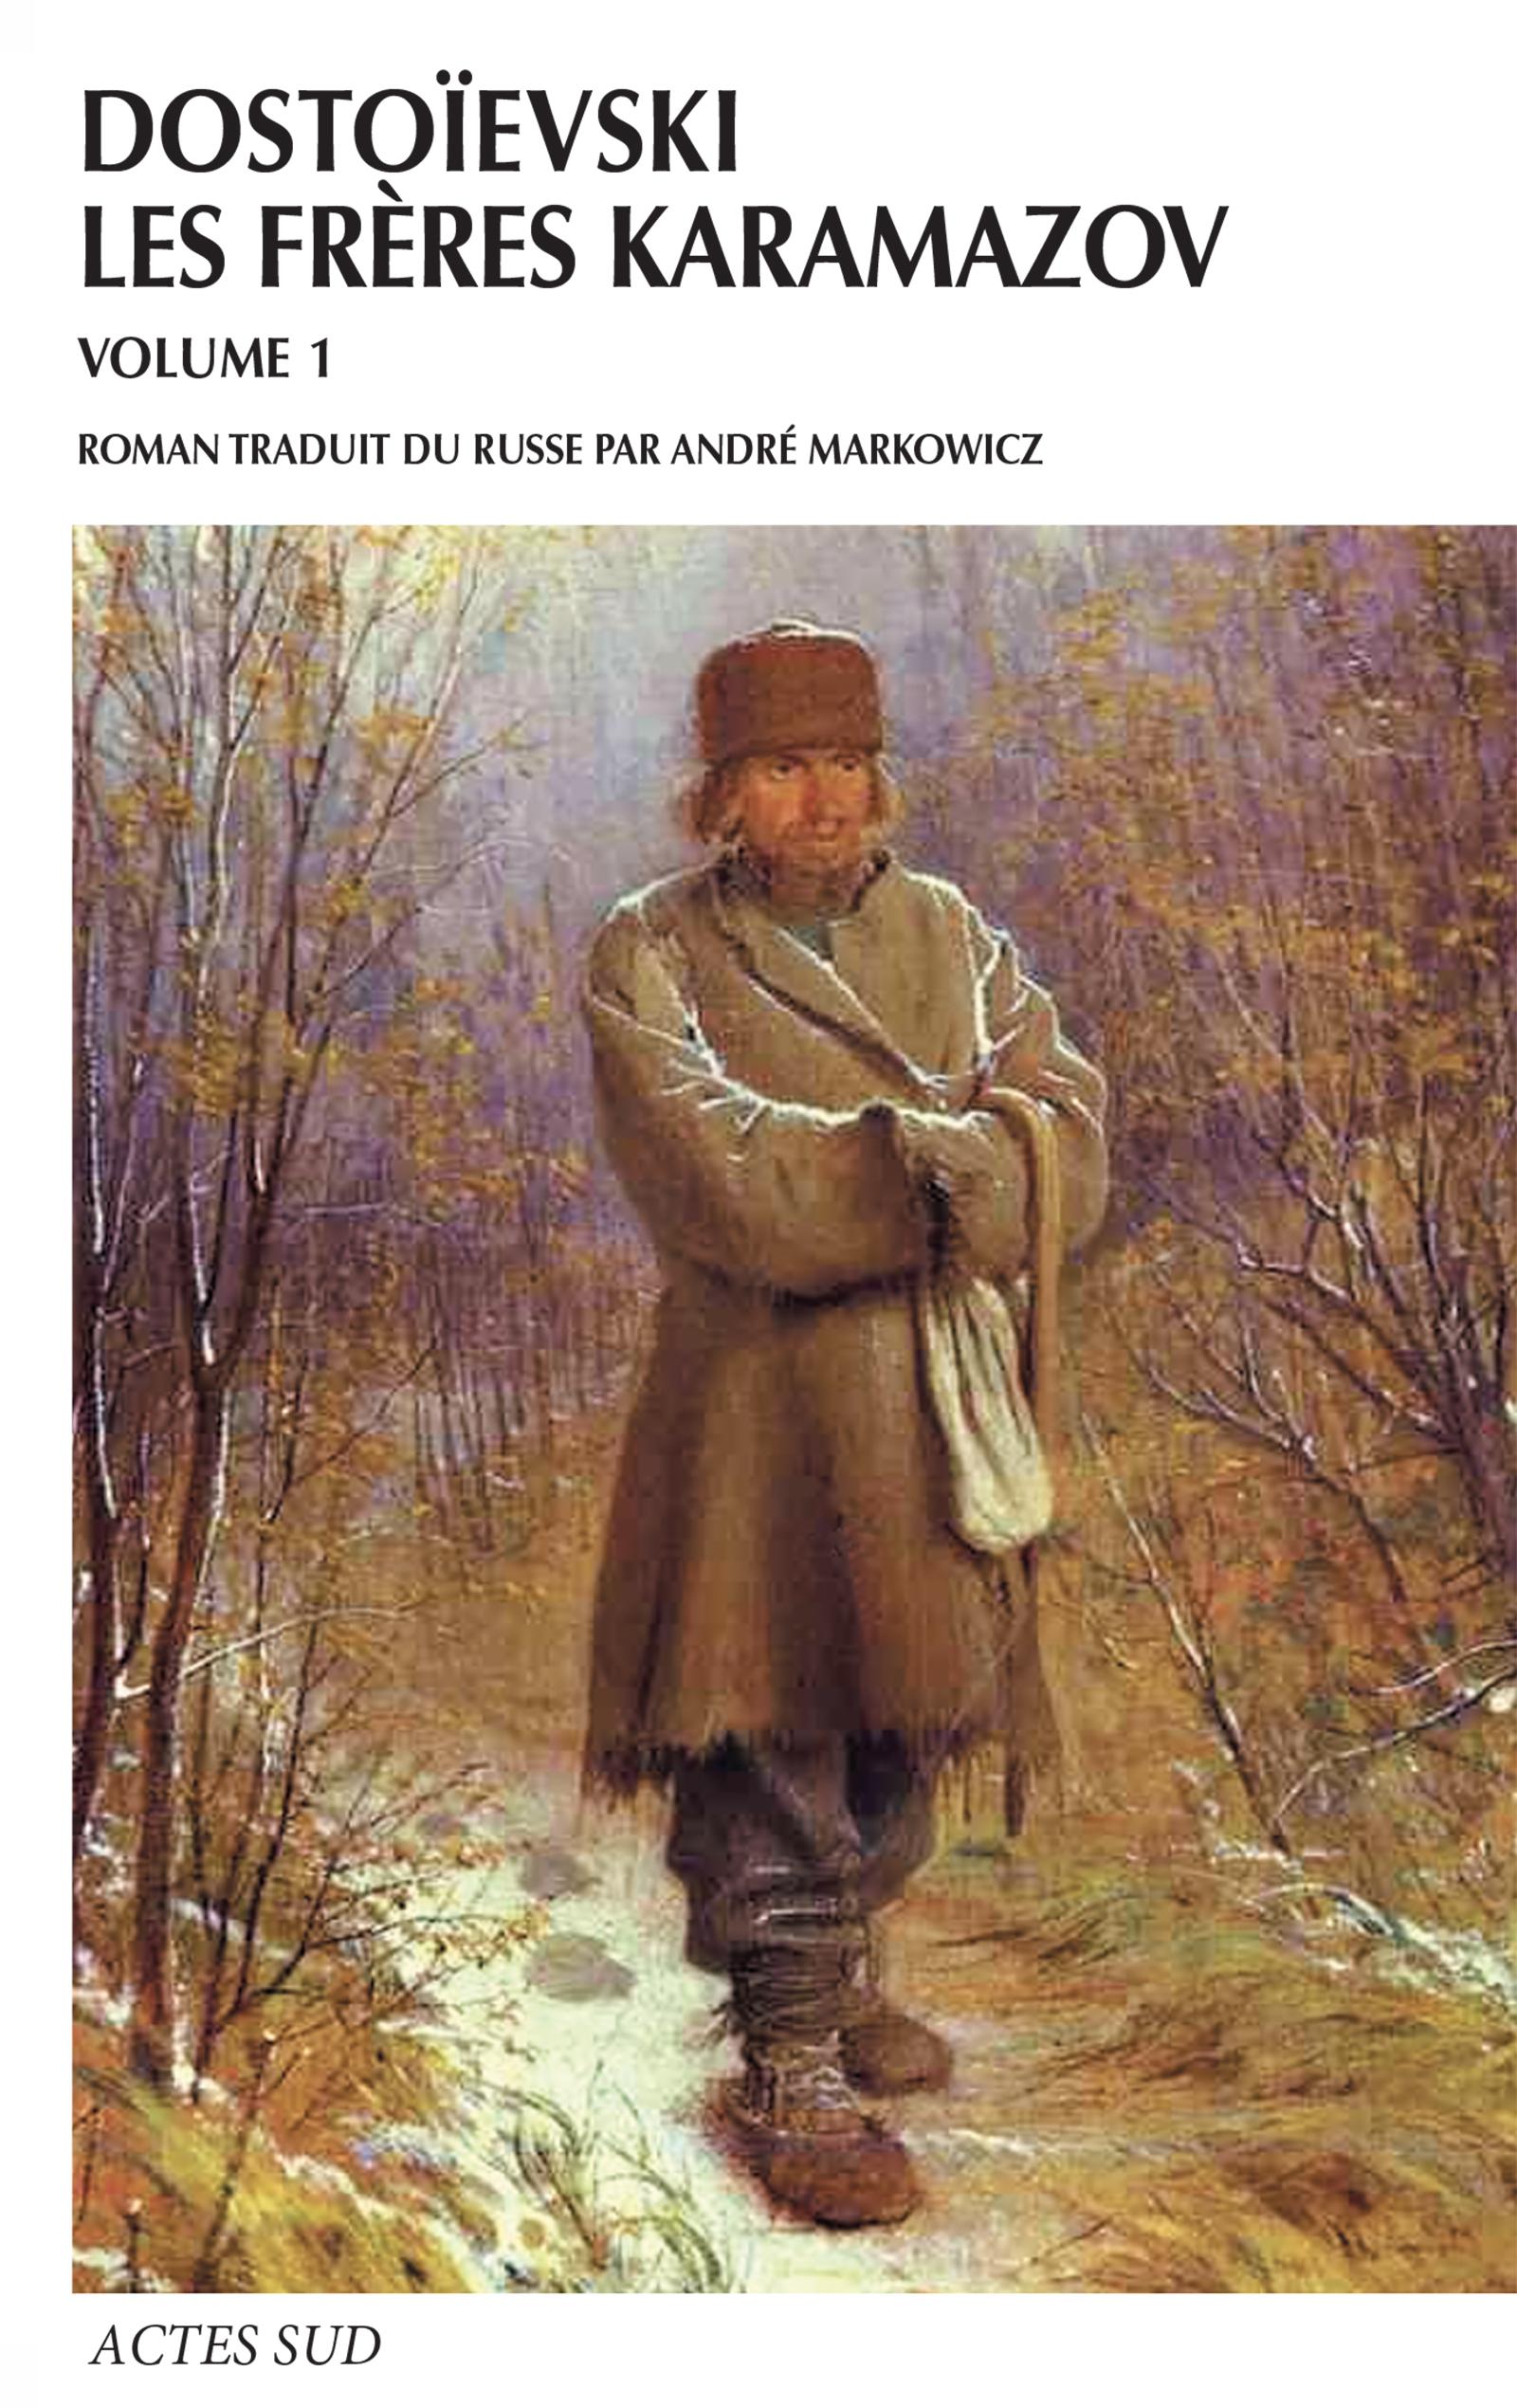 Couverture : Frères Karamazov Vol. 1 Fédor Dostoïevski